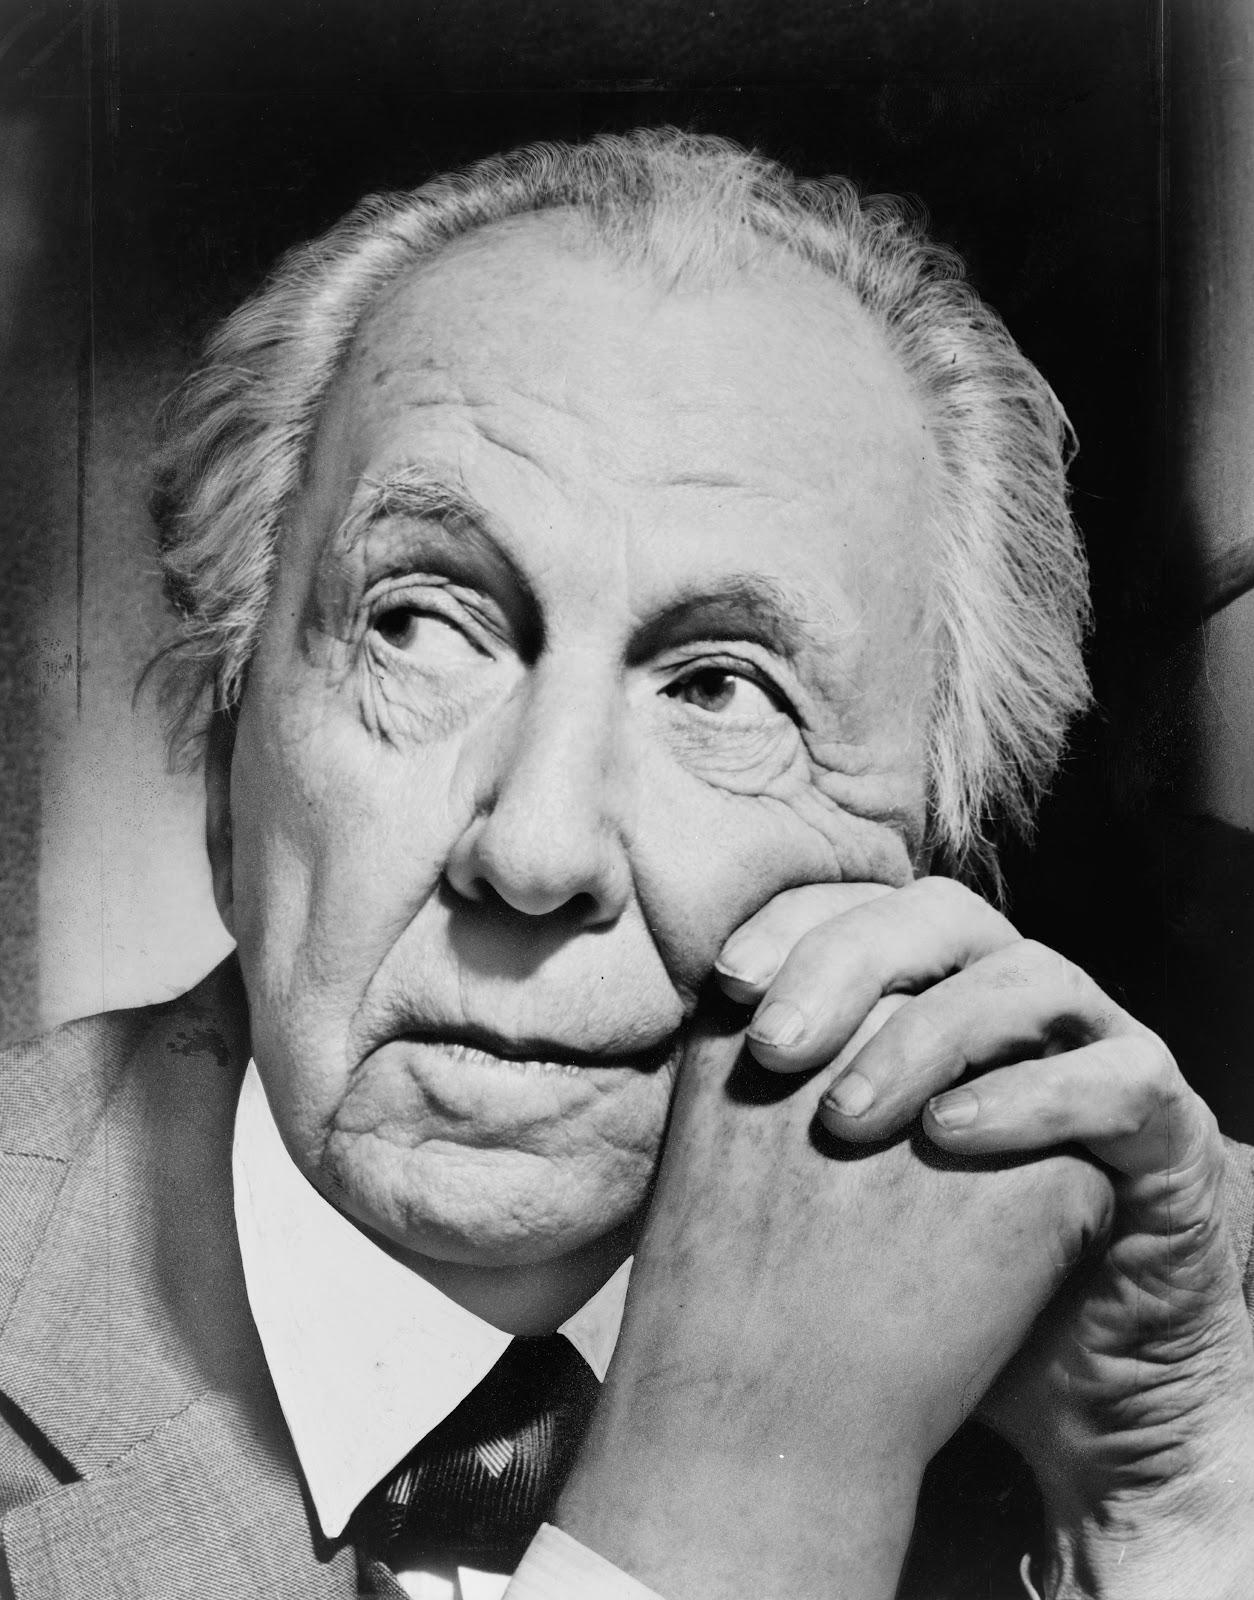 Frank Lloyd Wright - source: en.wikipedia.org